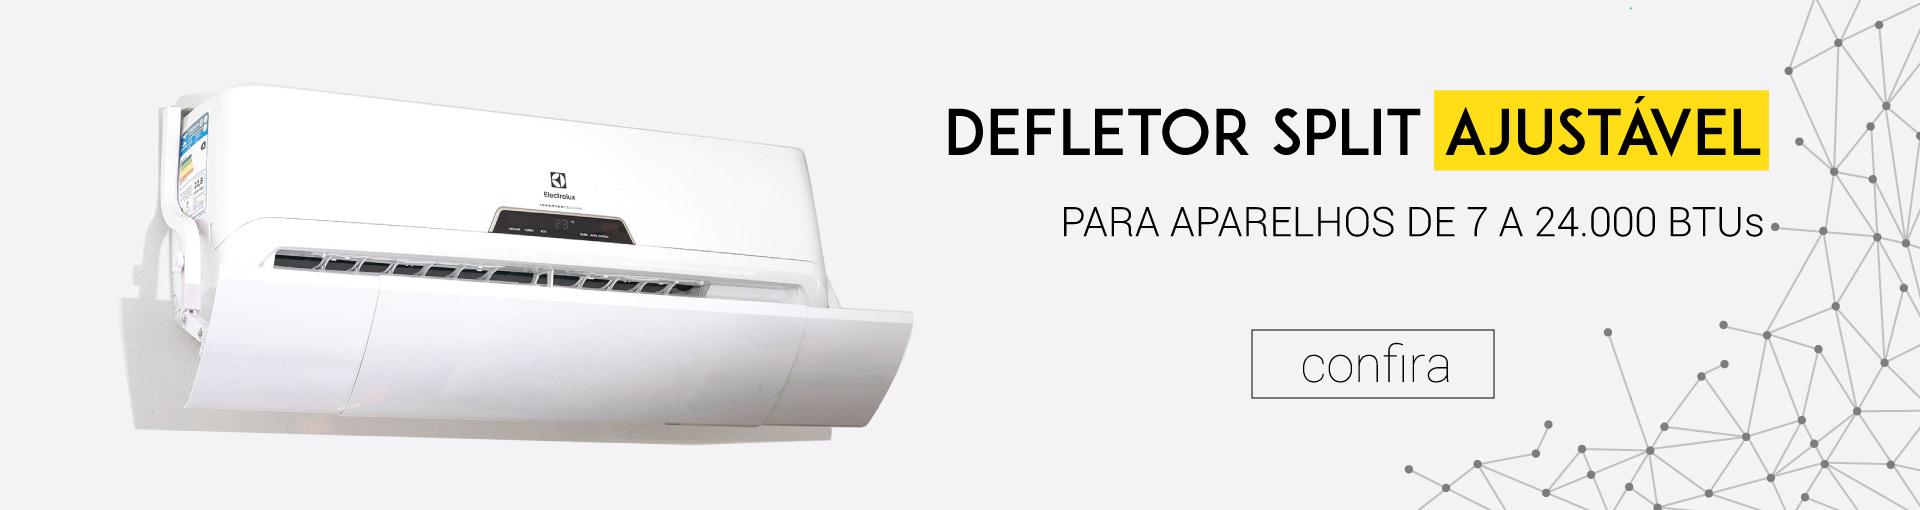 Defletor split ajustável